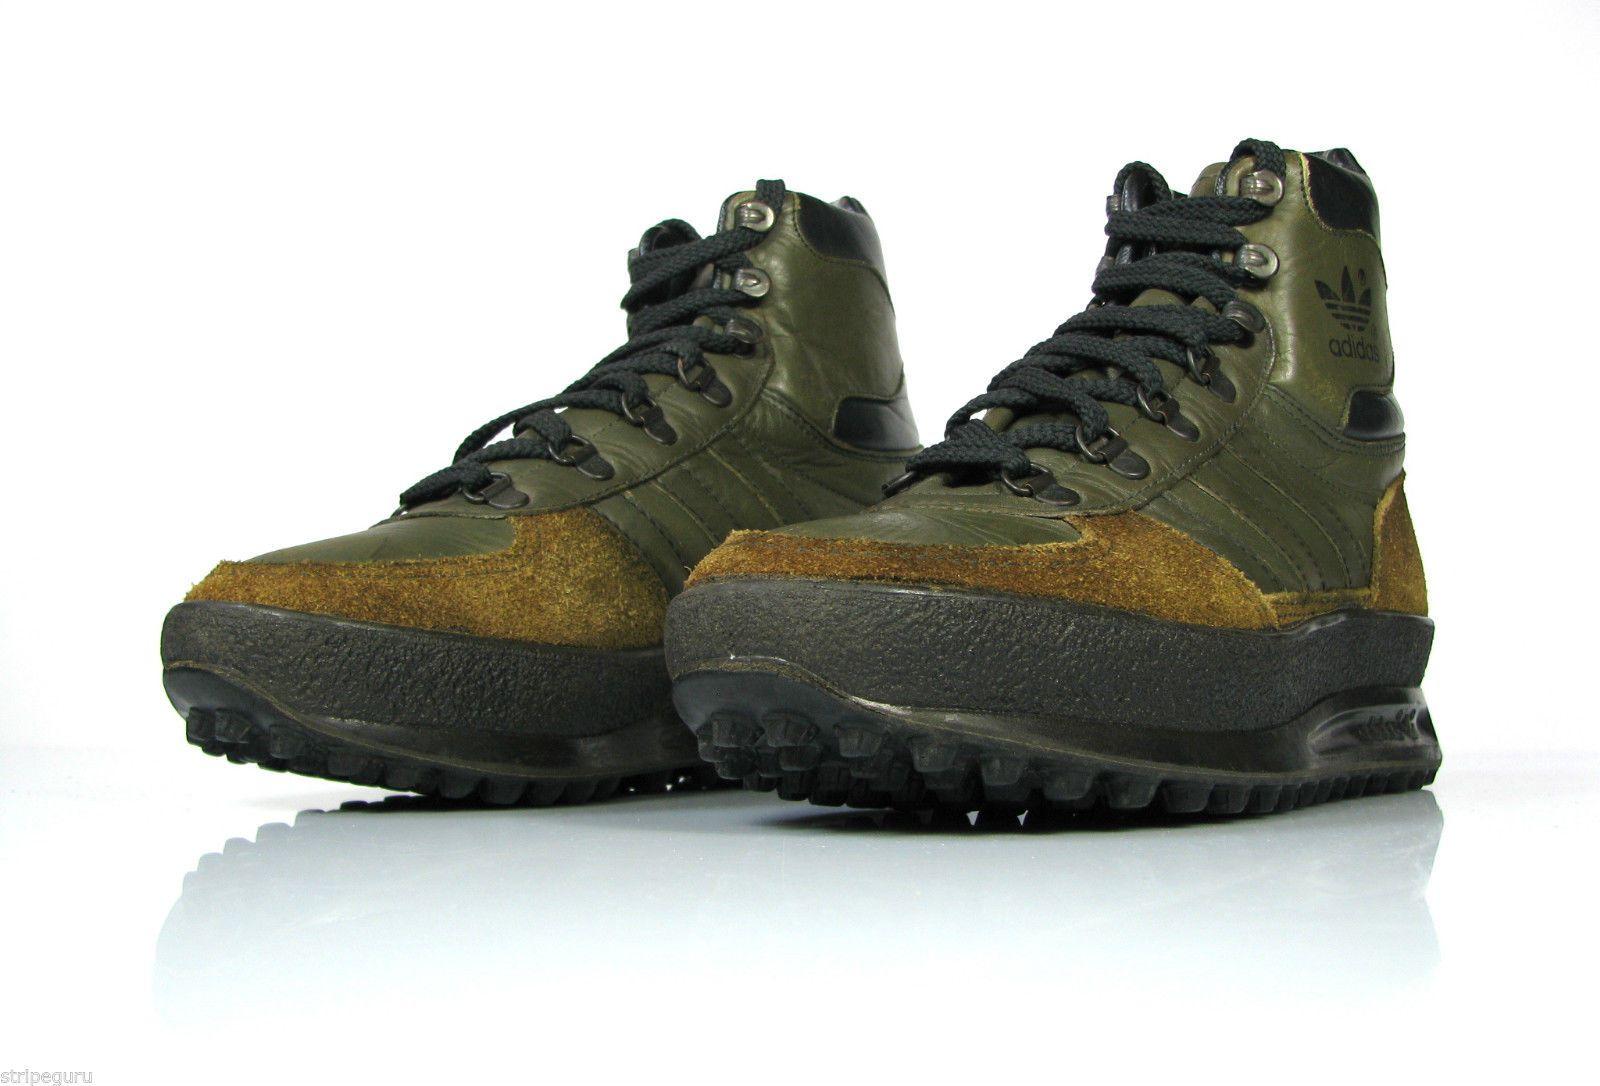 Adidas Vintage 5 Trekking Rare 80s Uk Outdoor Boots Womens Hiking yb76gf